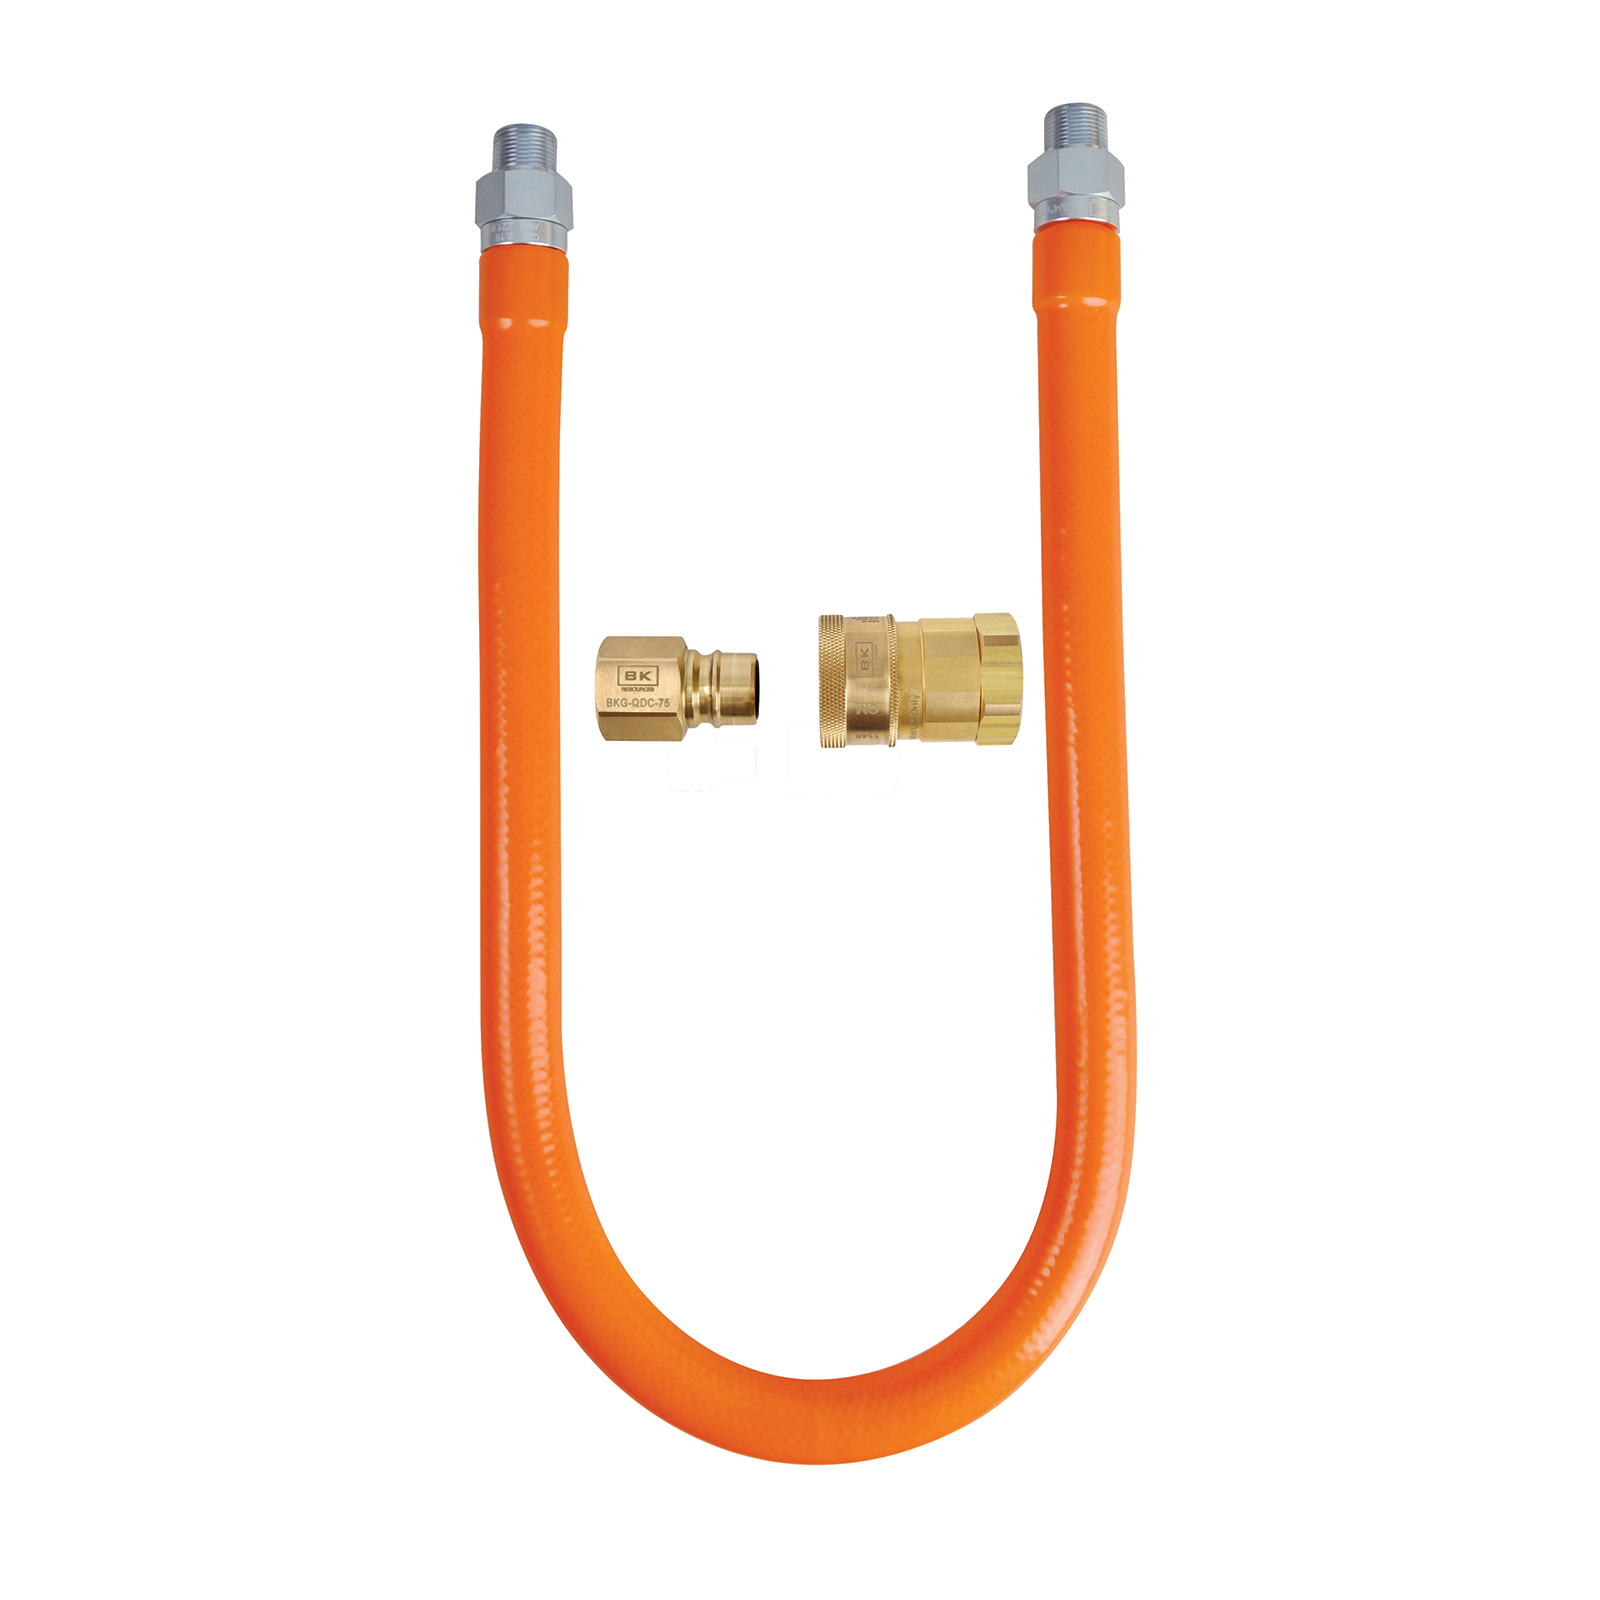 BK Resources BKG-GHC-7560-QD-PT gas connector hose kit